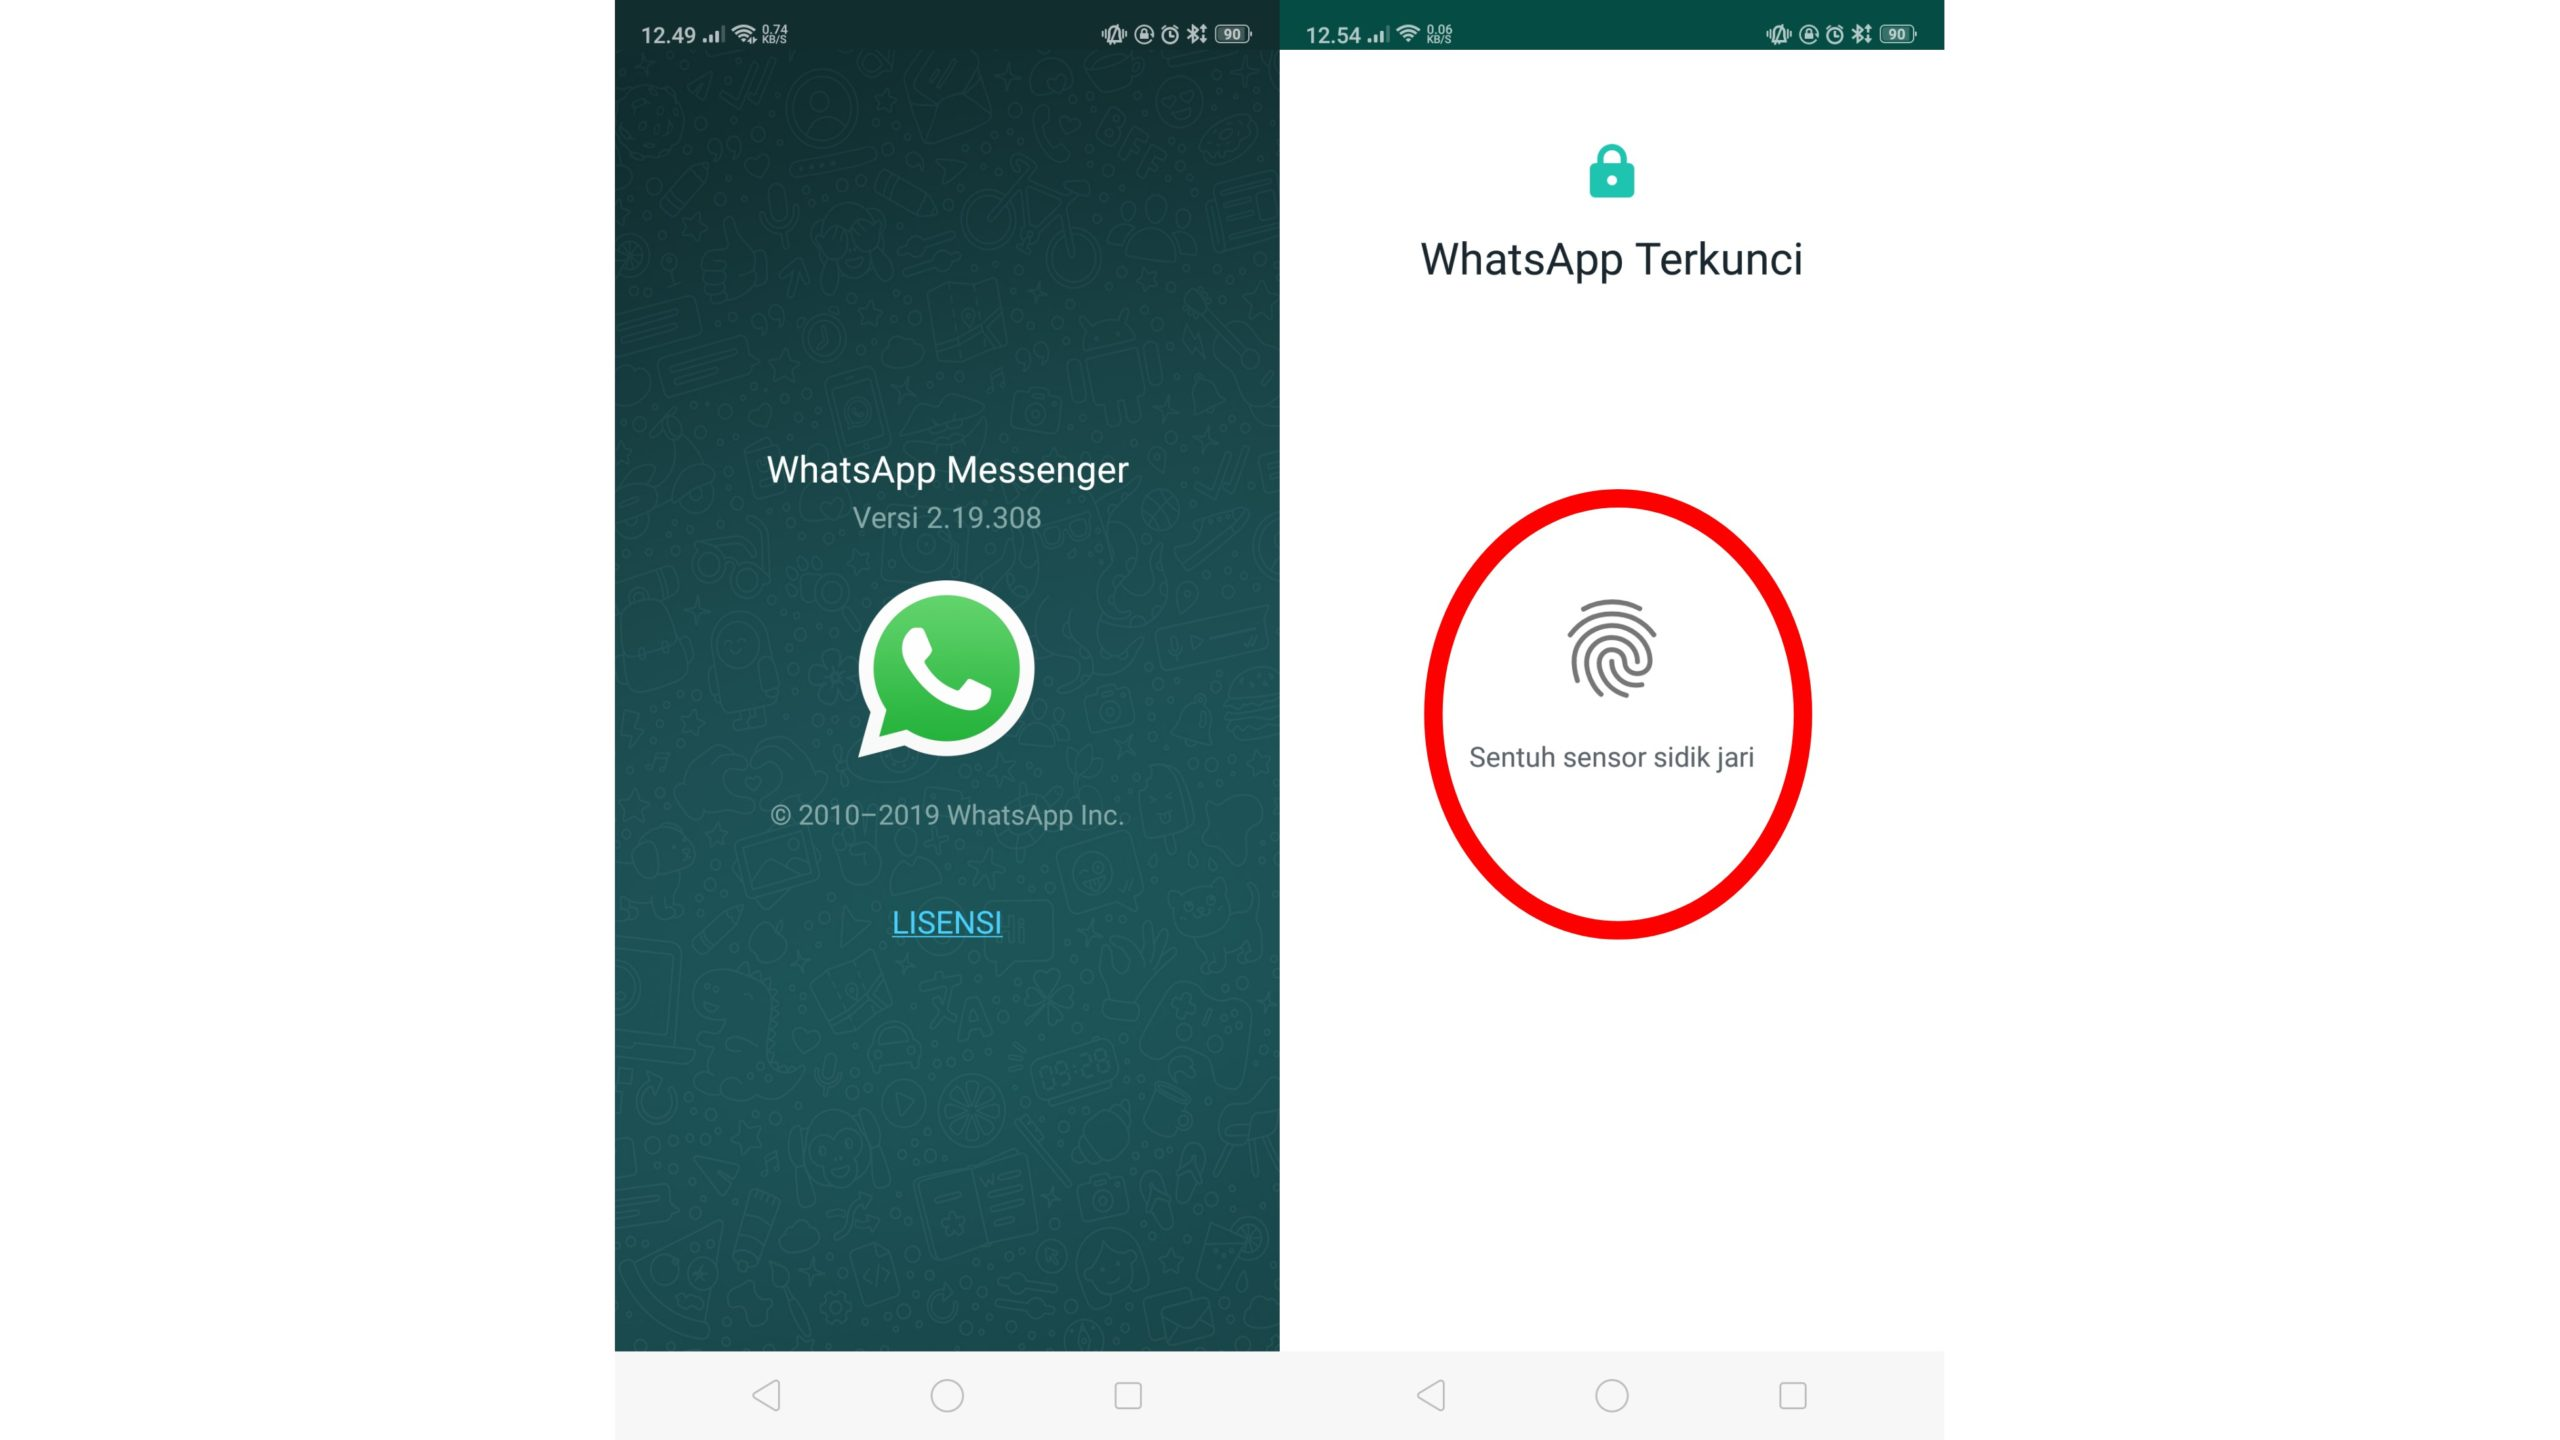 Otentikasi Sidik Jari WhatsApp